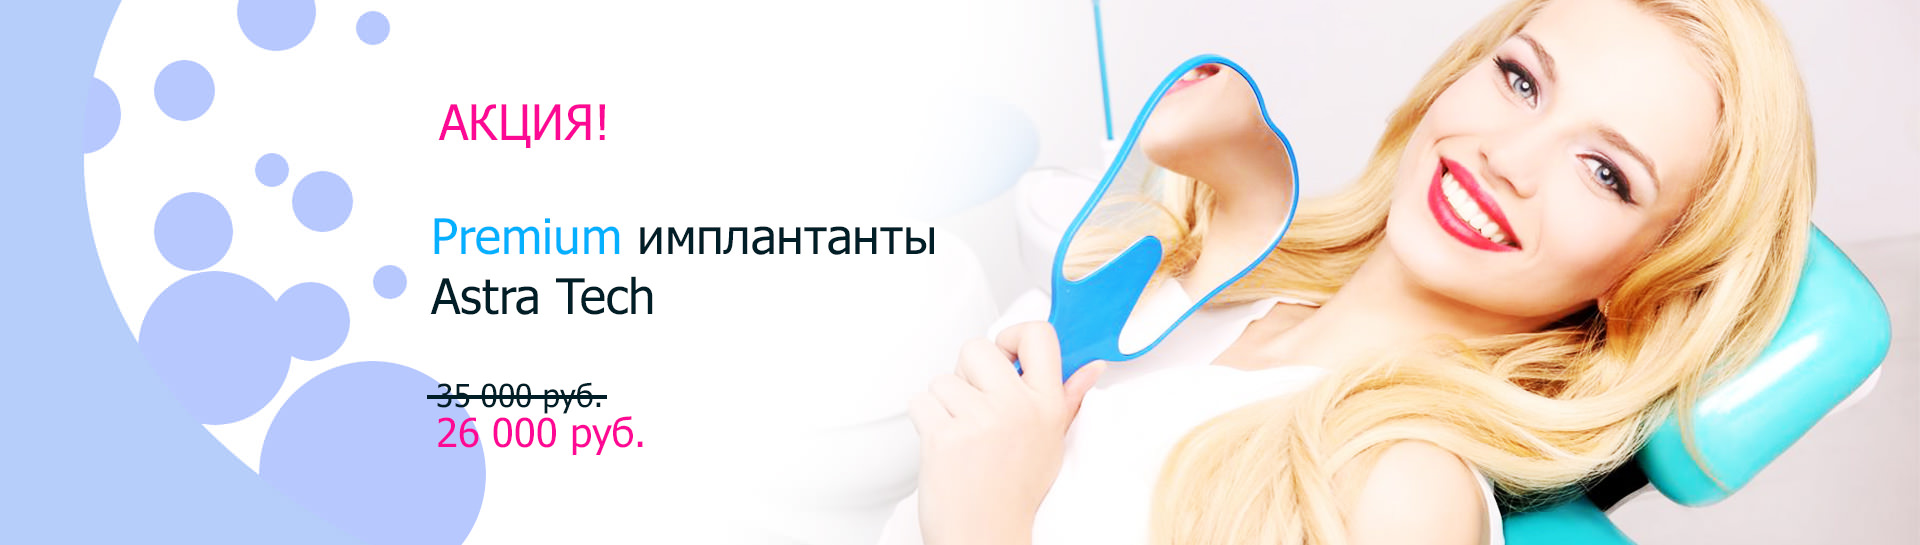 https://denta-maryino.ru/wp-content/uploads/Astra.jpg 1x, https://denta-maryino.ru/wp-content/cache/thumb/31/975495da361d331_1320x545.jpg 1320w